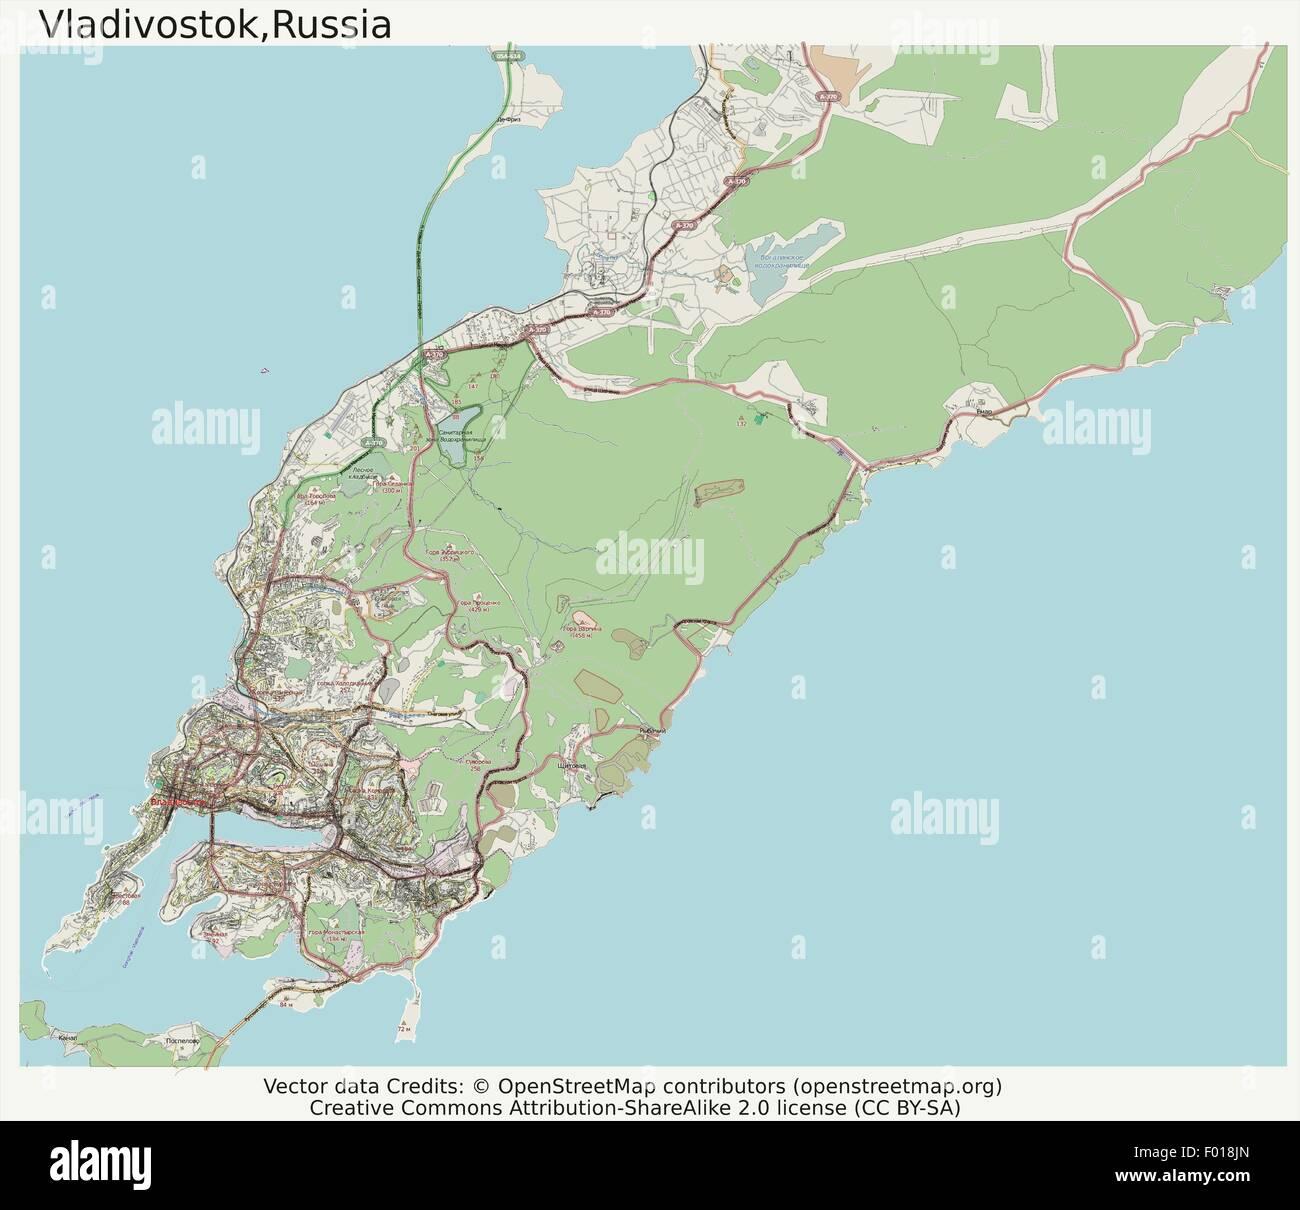 Vladivostok Russia city map aerial view Stock Vector Art